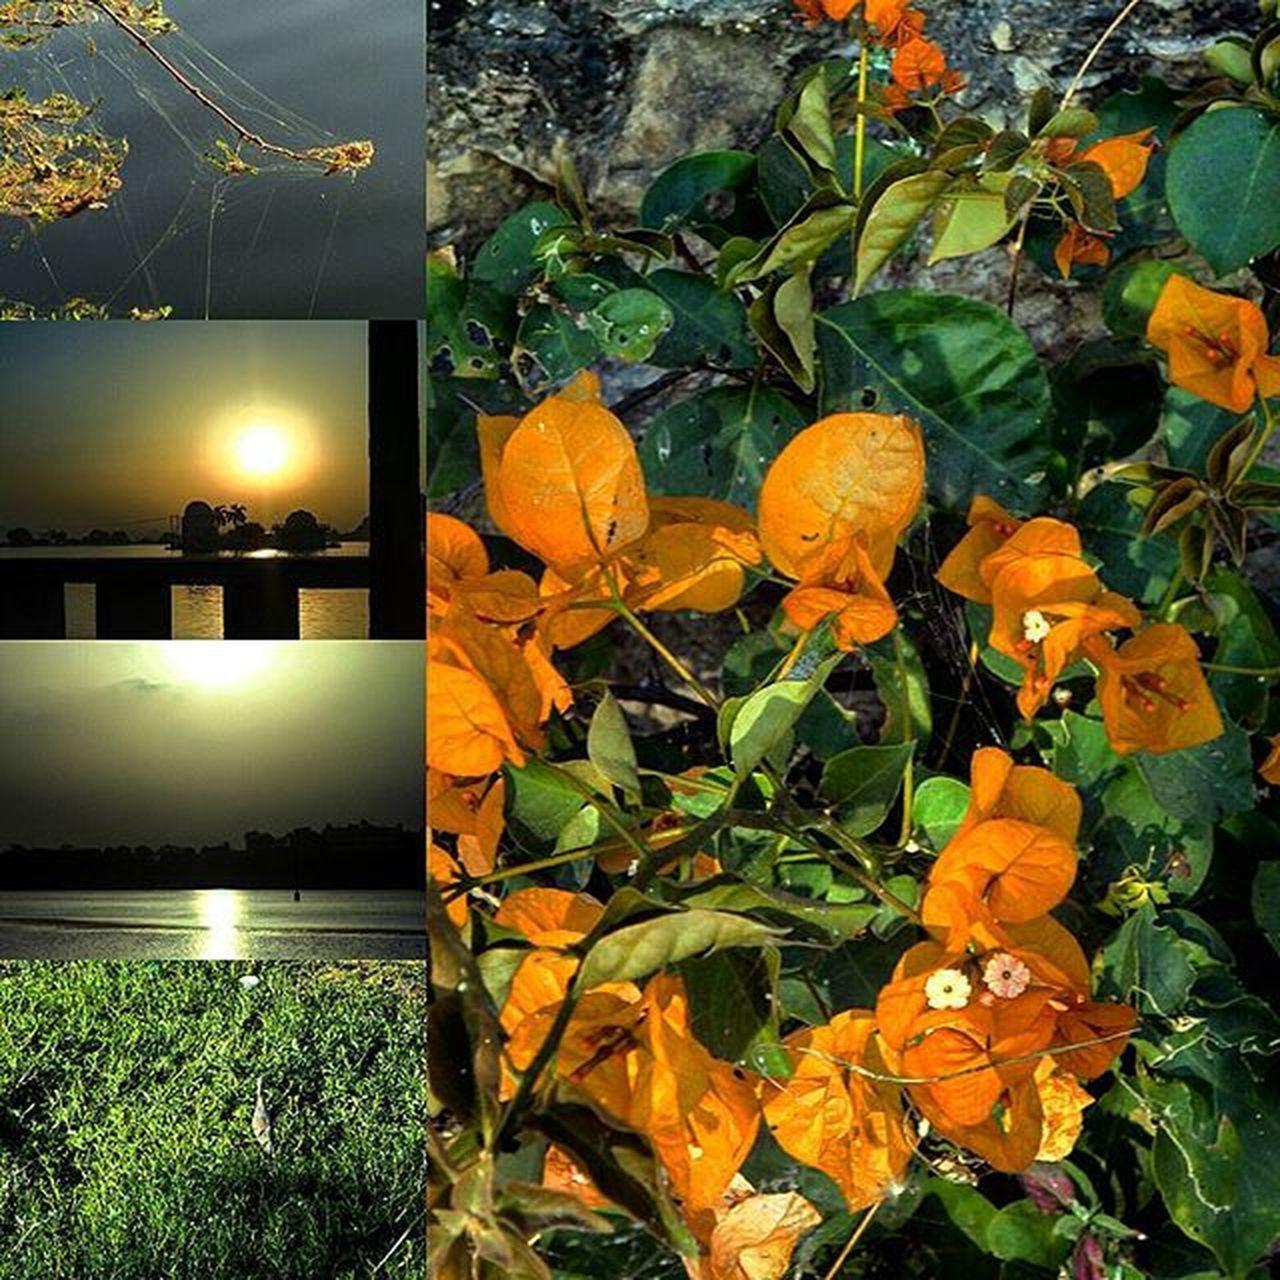 LAYOTS👌💞 Morning💜 Freshness Photography Photographer Unified Earlymorningride Presta InstaSanps Randomclicks Loveoflife UdaipurMorningsPhotoNumber_7 Udaipurlove Fatehsagar Energetic MyFirstSnapOfTheDay UdaipurDays .....😊😊😄😃